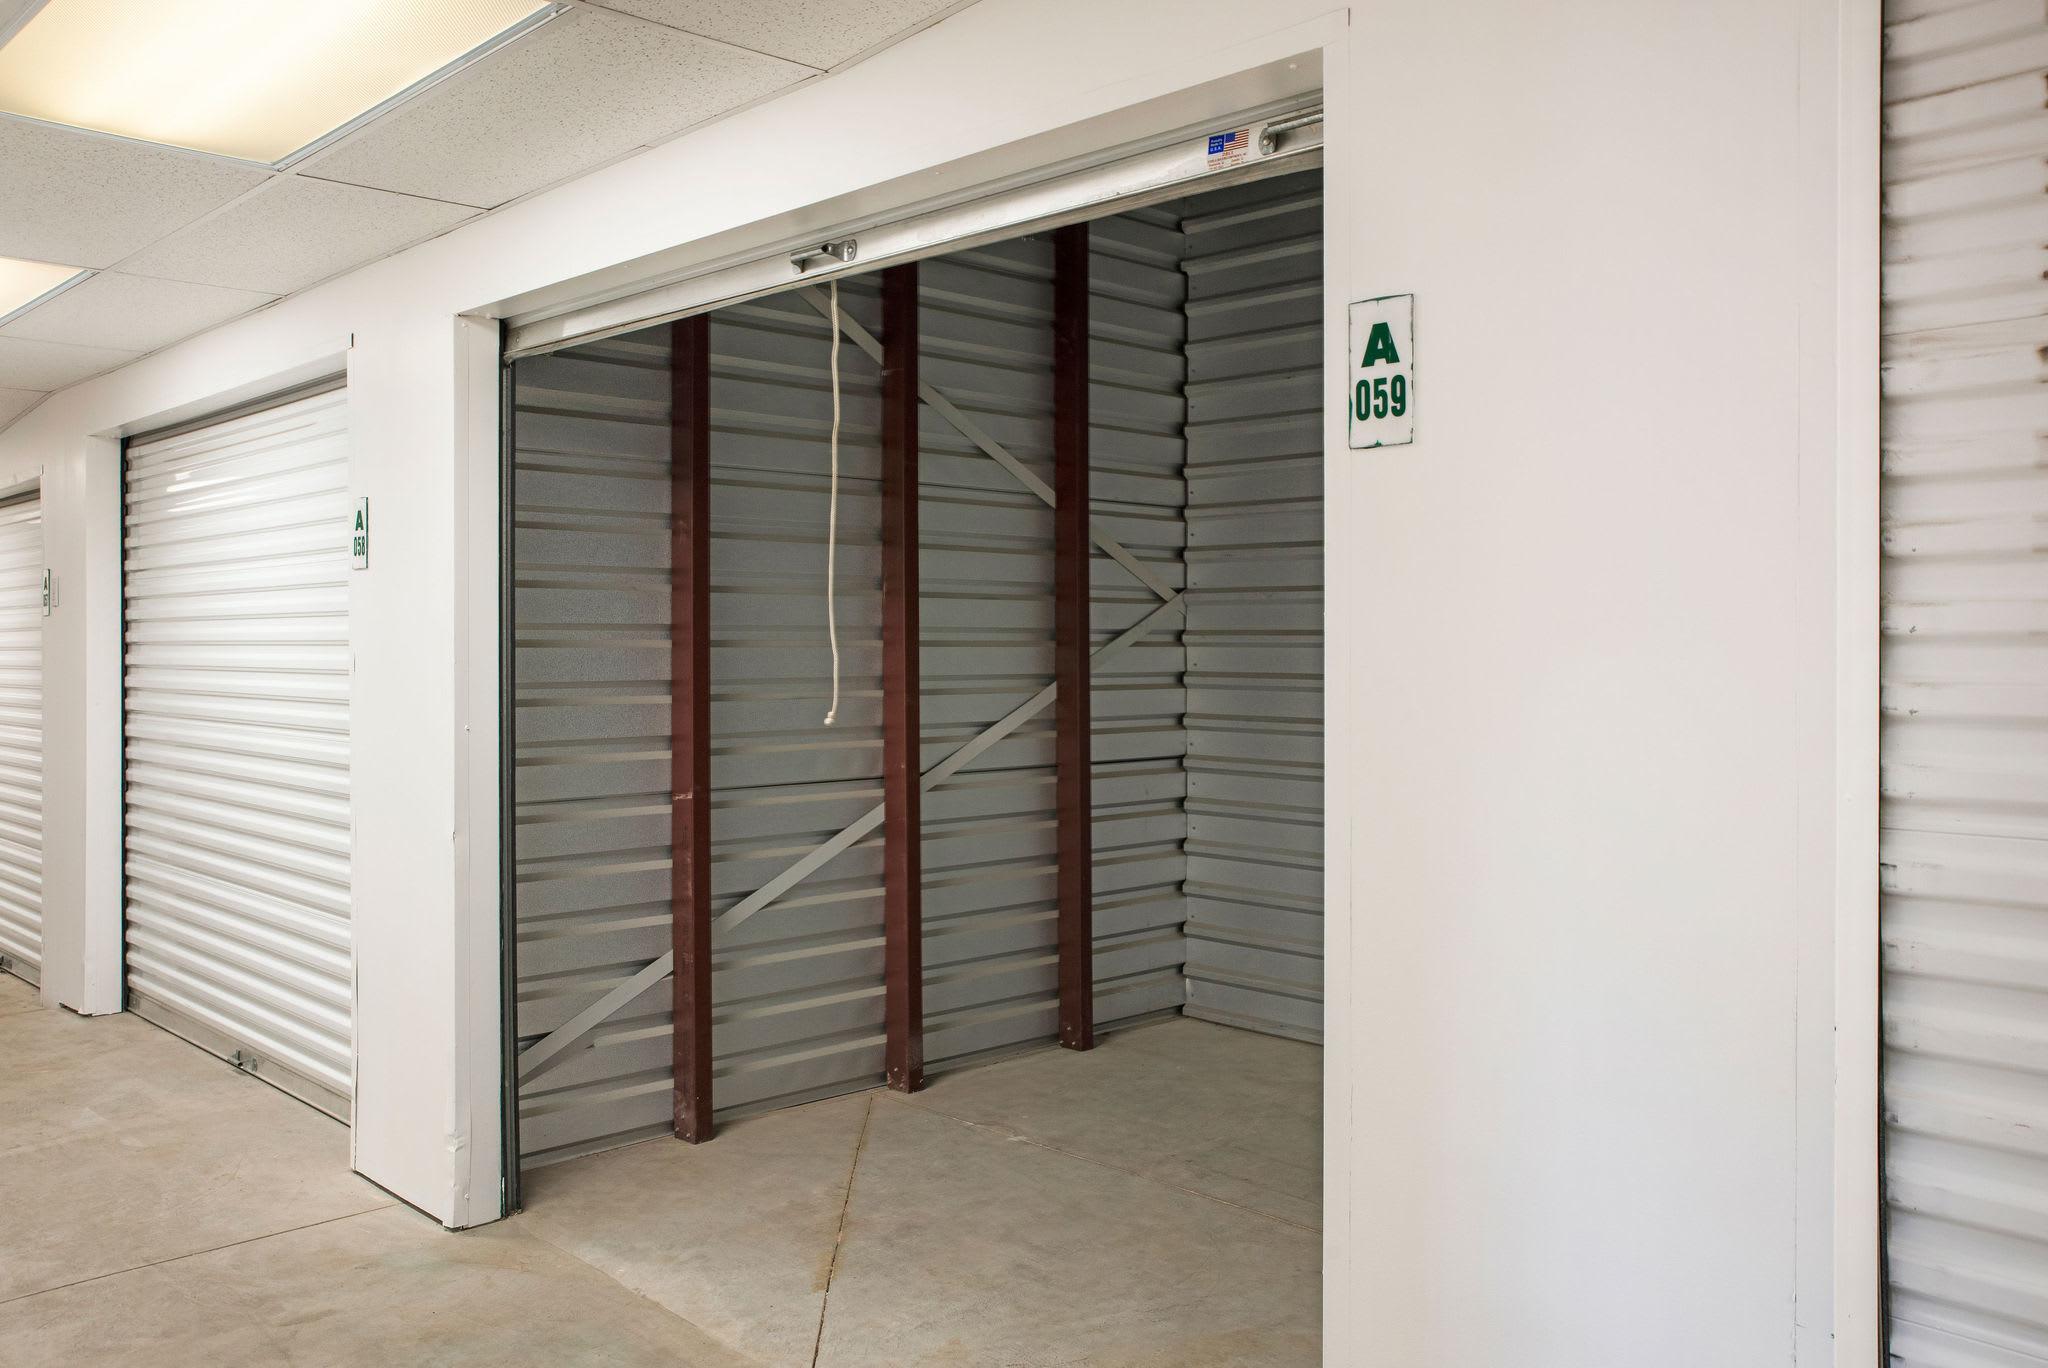 Storage unit at Stor'em Self Storage in Sandy, Utah